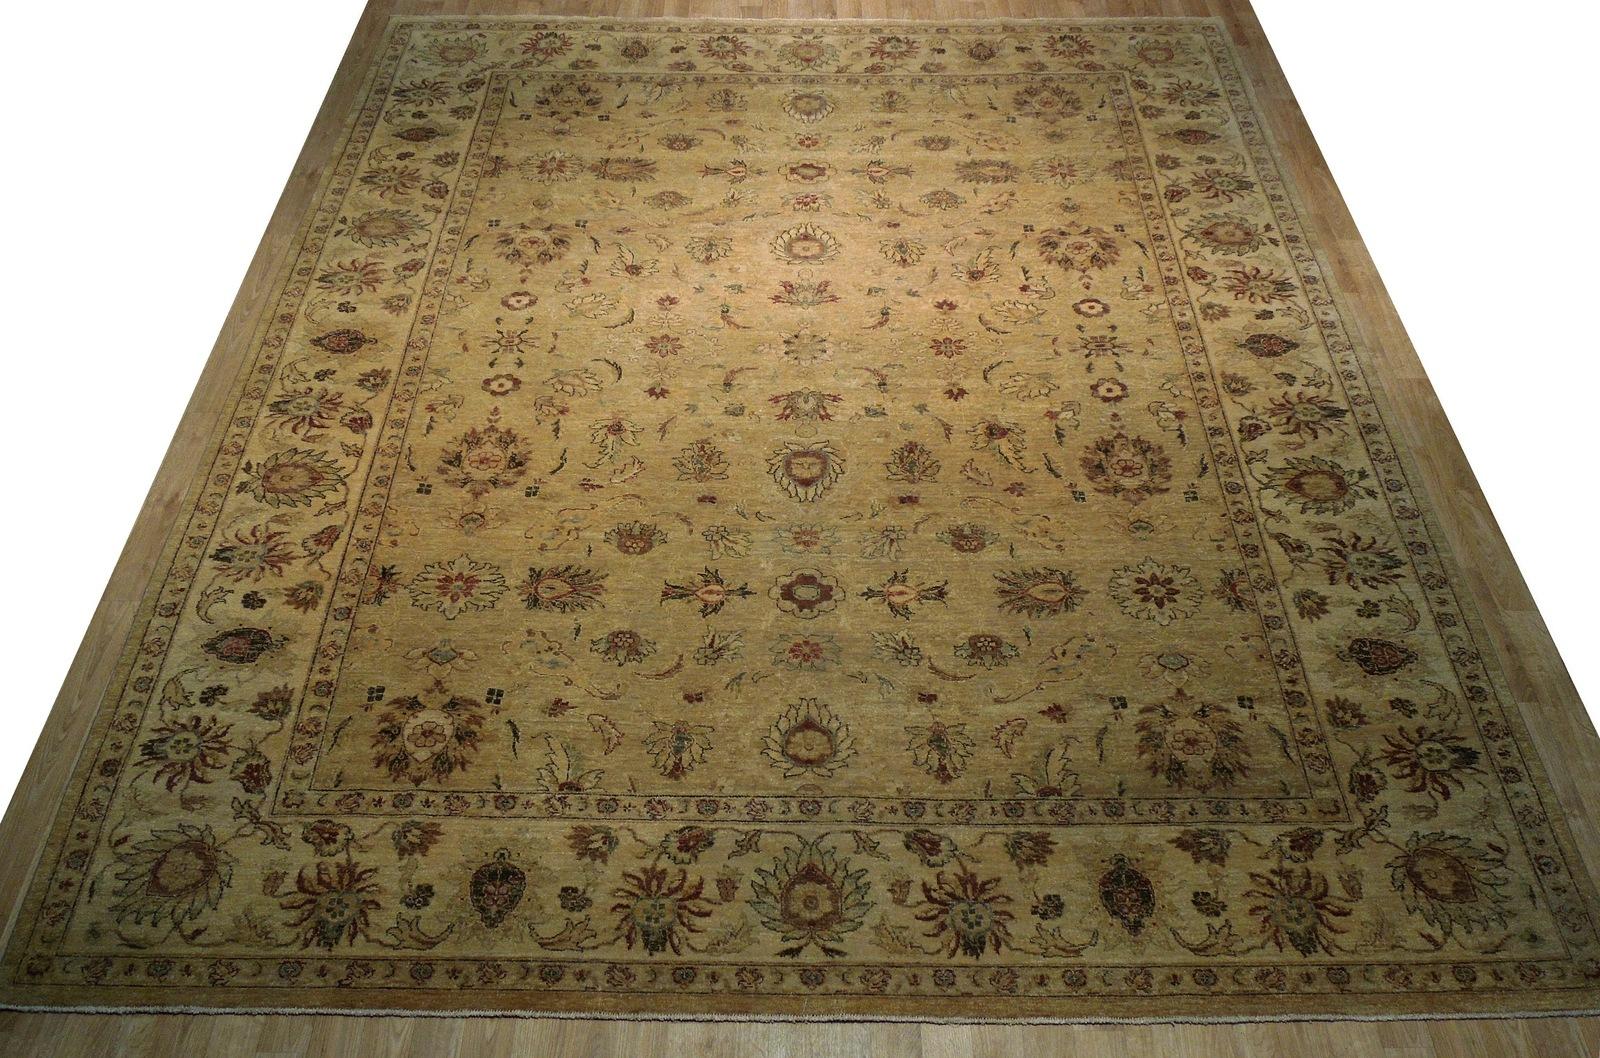 Honey Gold Wool Carpet 9' x 12' New Original Ziglar Oushak Hand-Knotted Rug